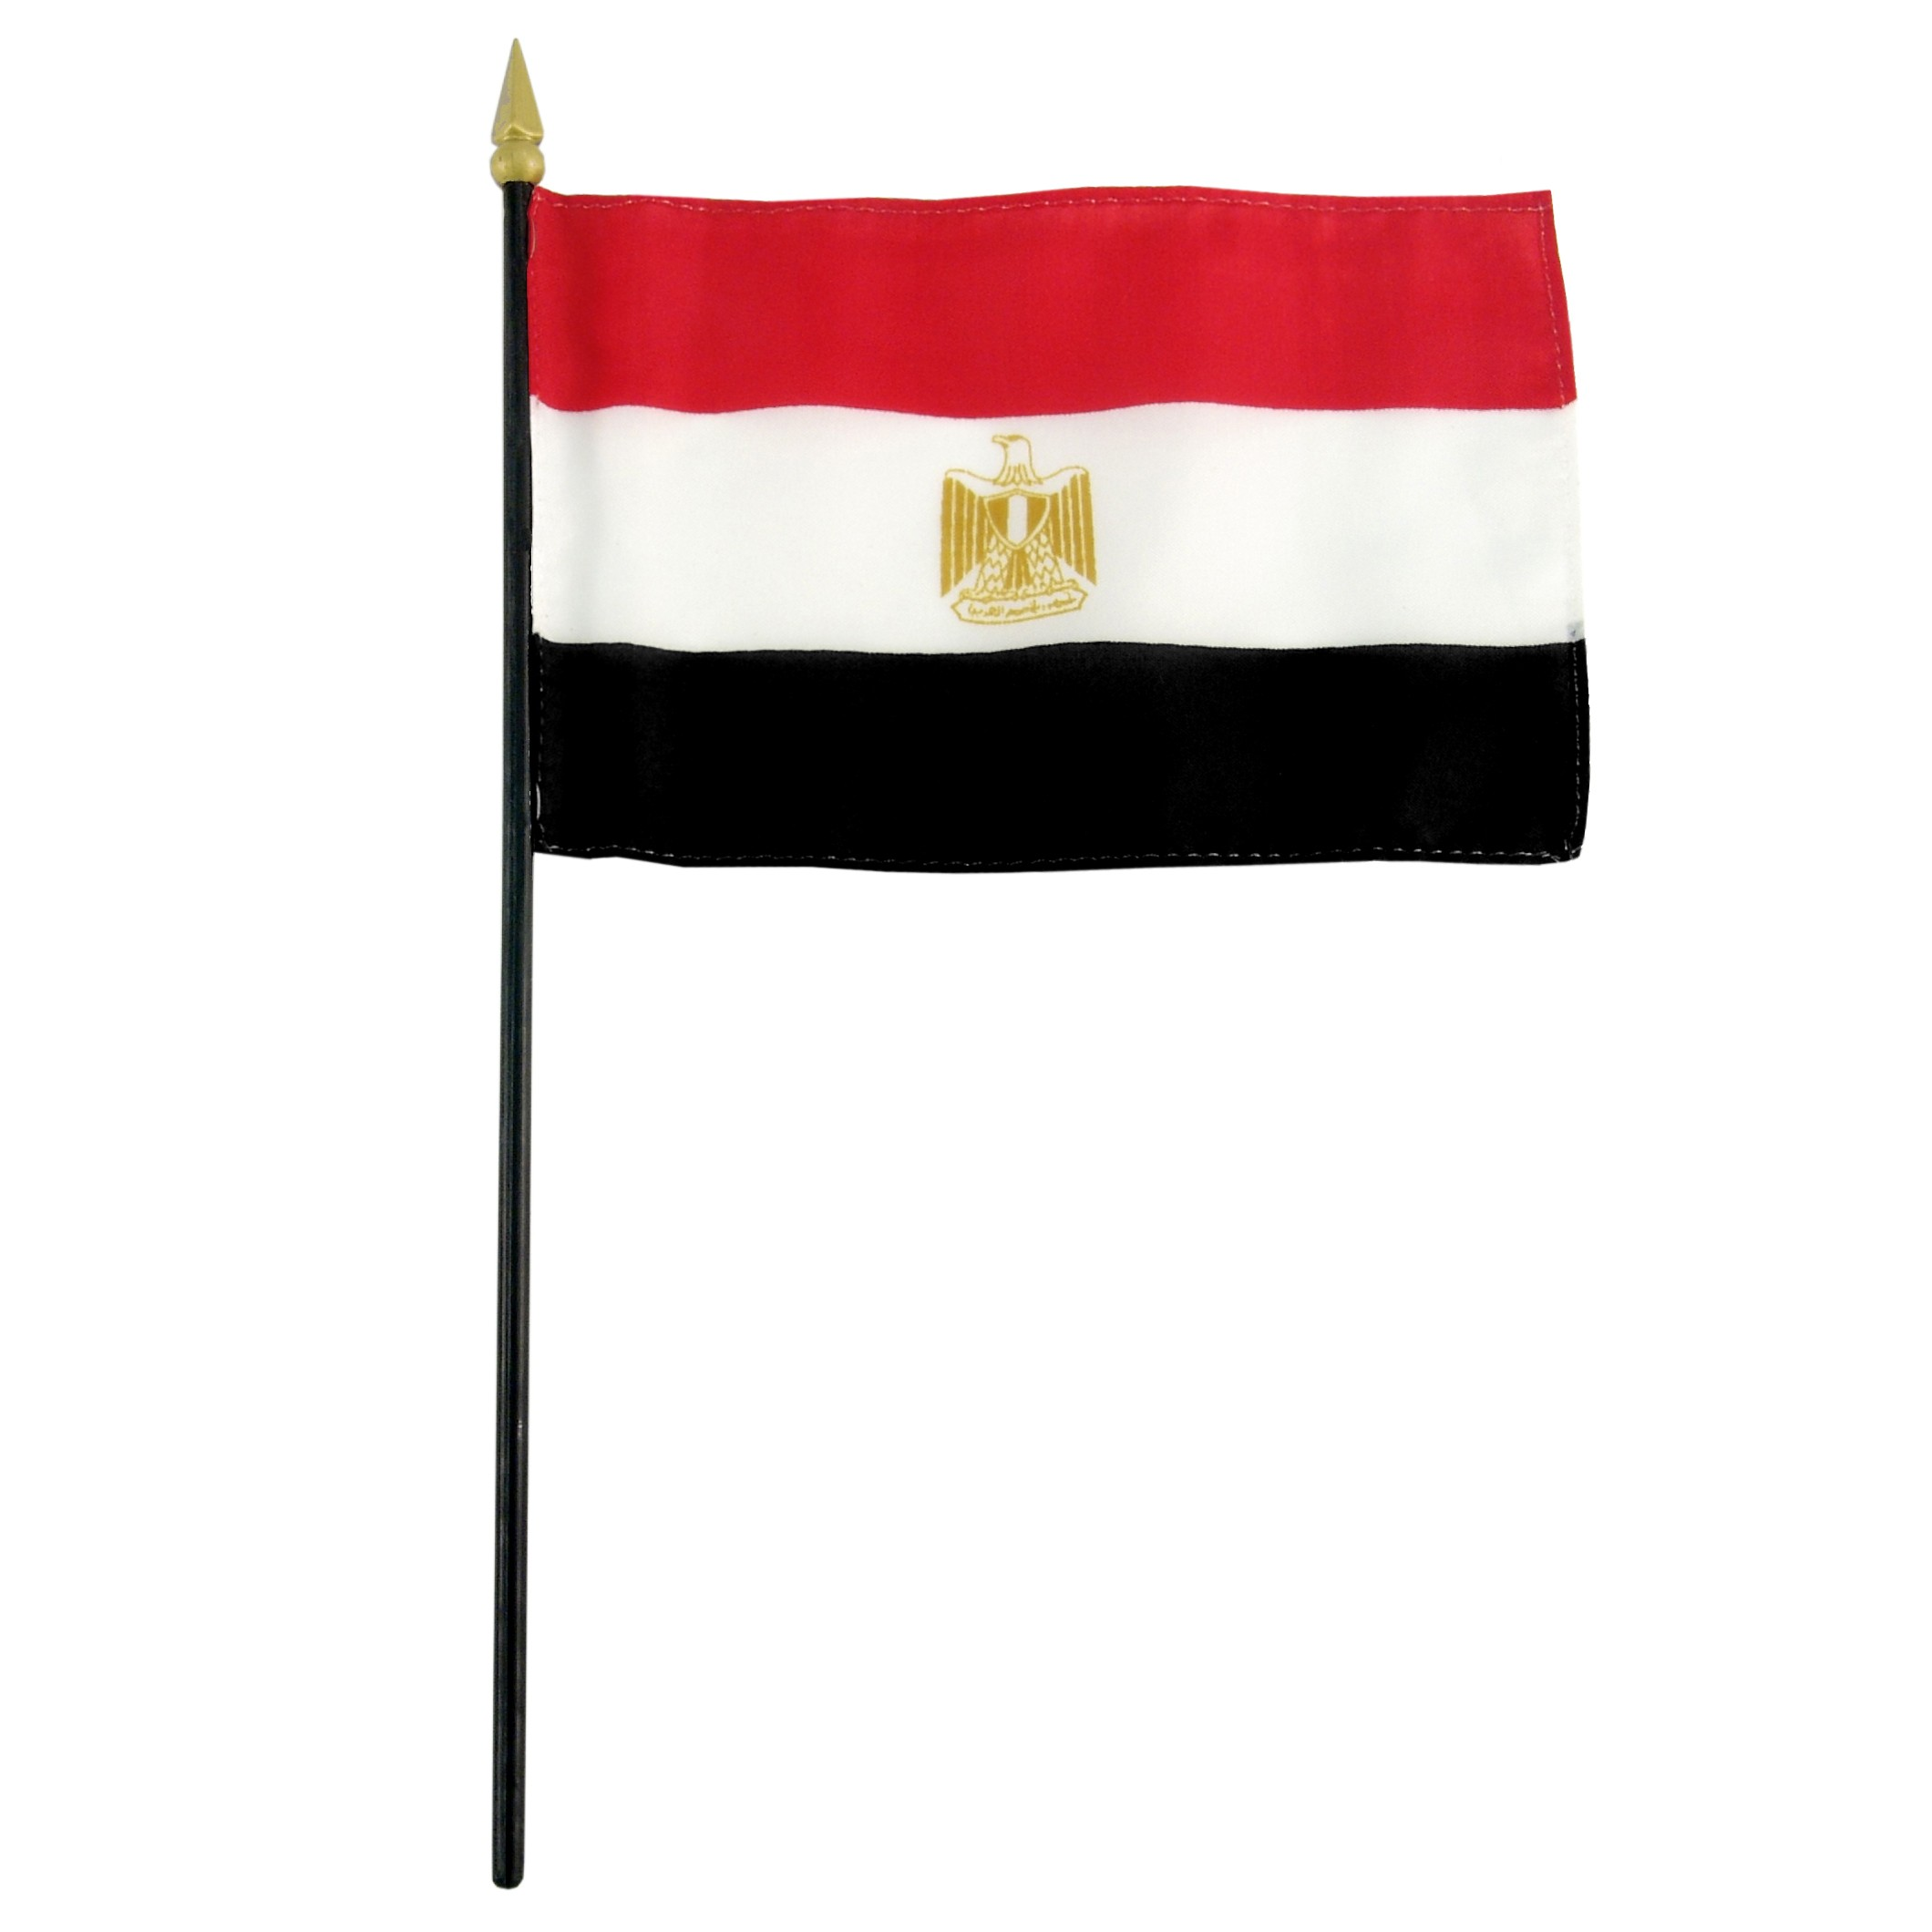 High Resolution Wallpaper | Flag Of Egypt 2120x2120 px